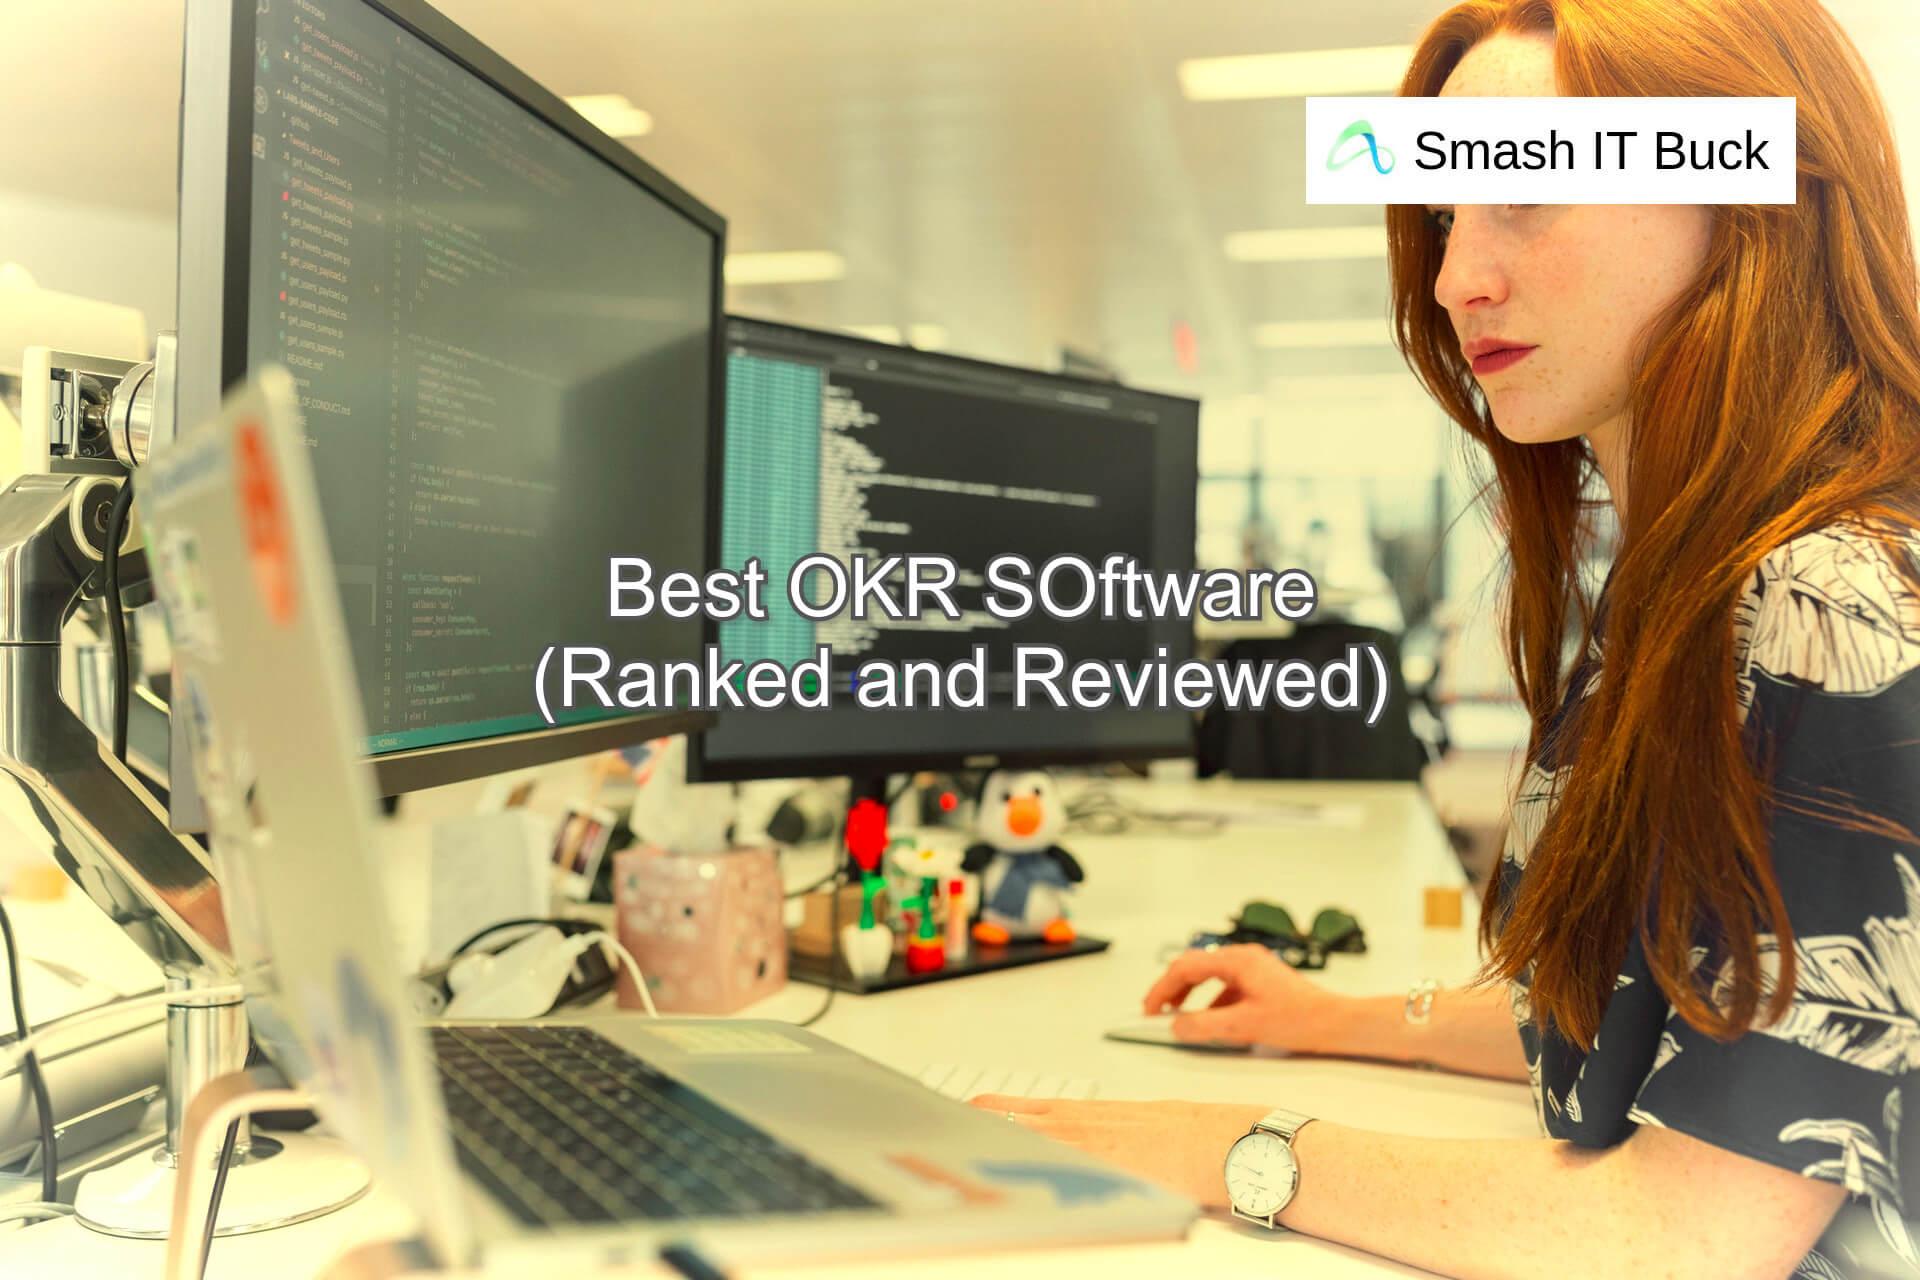 Best OKR Software of 2021 Reviewed